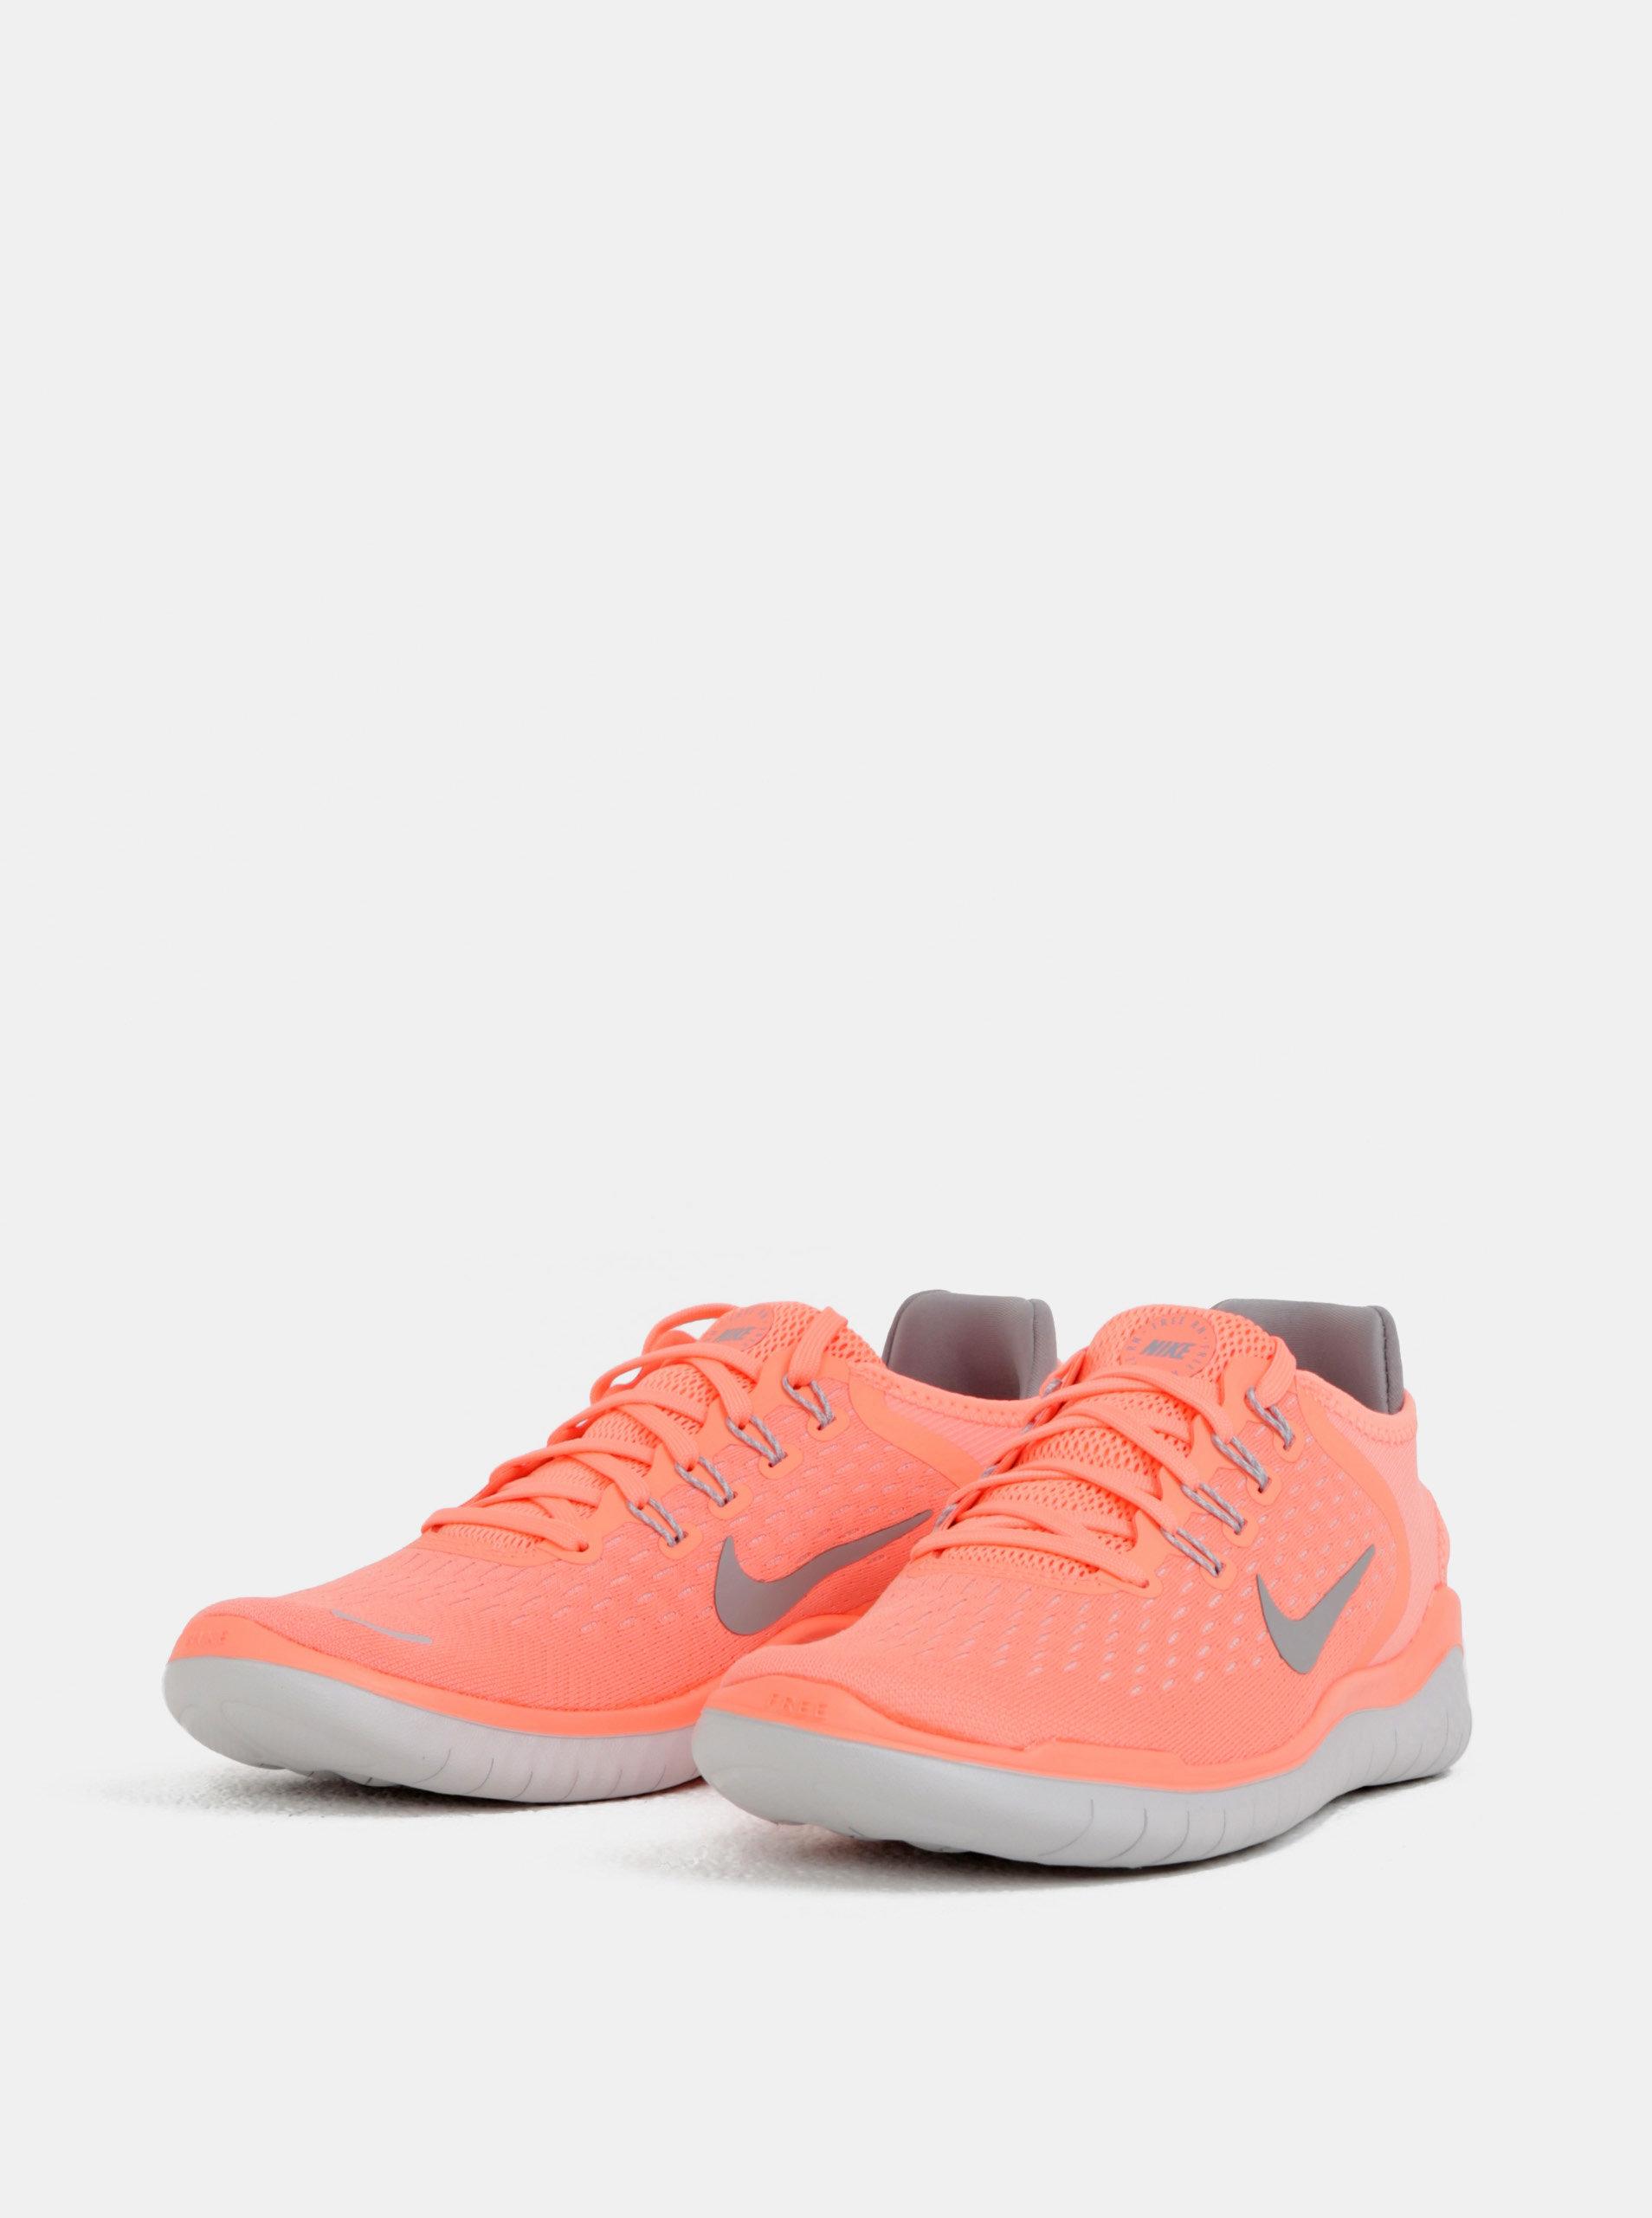 05e0c690a57c Rn Zoot Tenisky Neonovooranžové 2018 sk Free Dámske Nike w7nqBPI